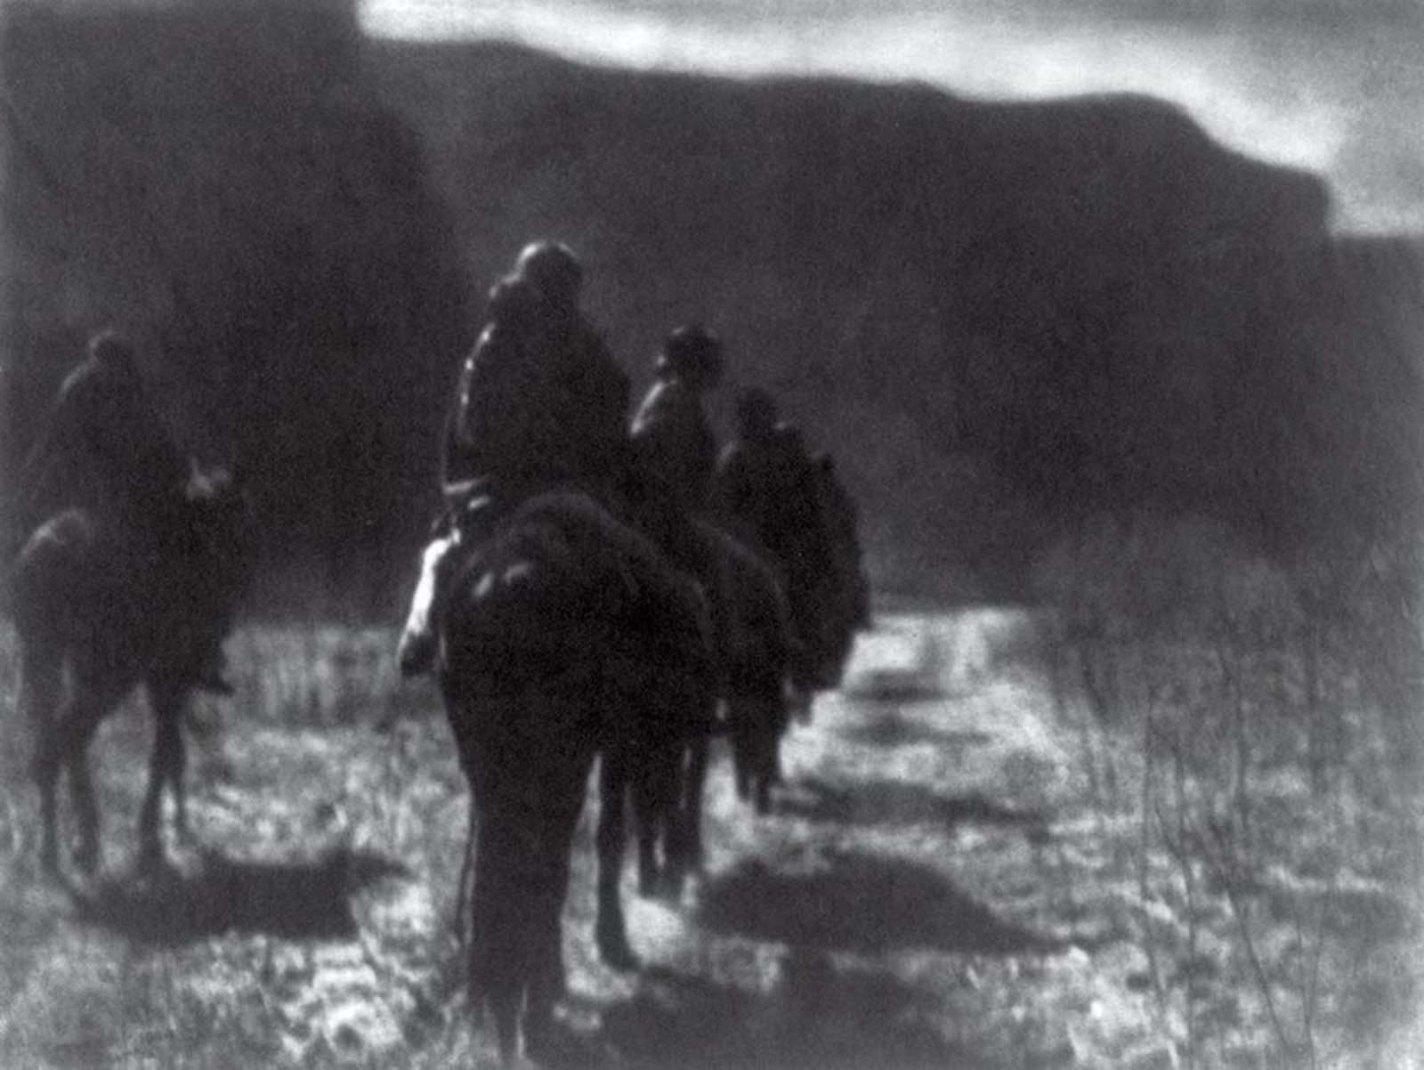 History photo The Vanishing Race, Edward S. Curtis, 1904